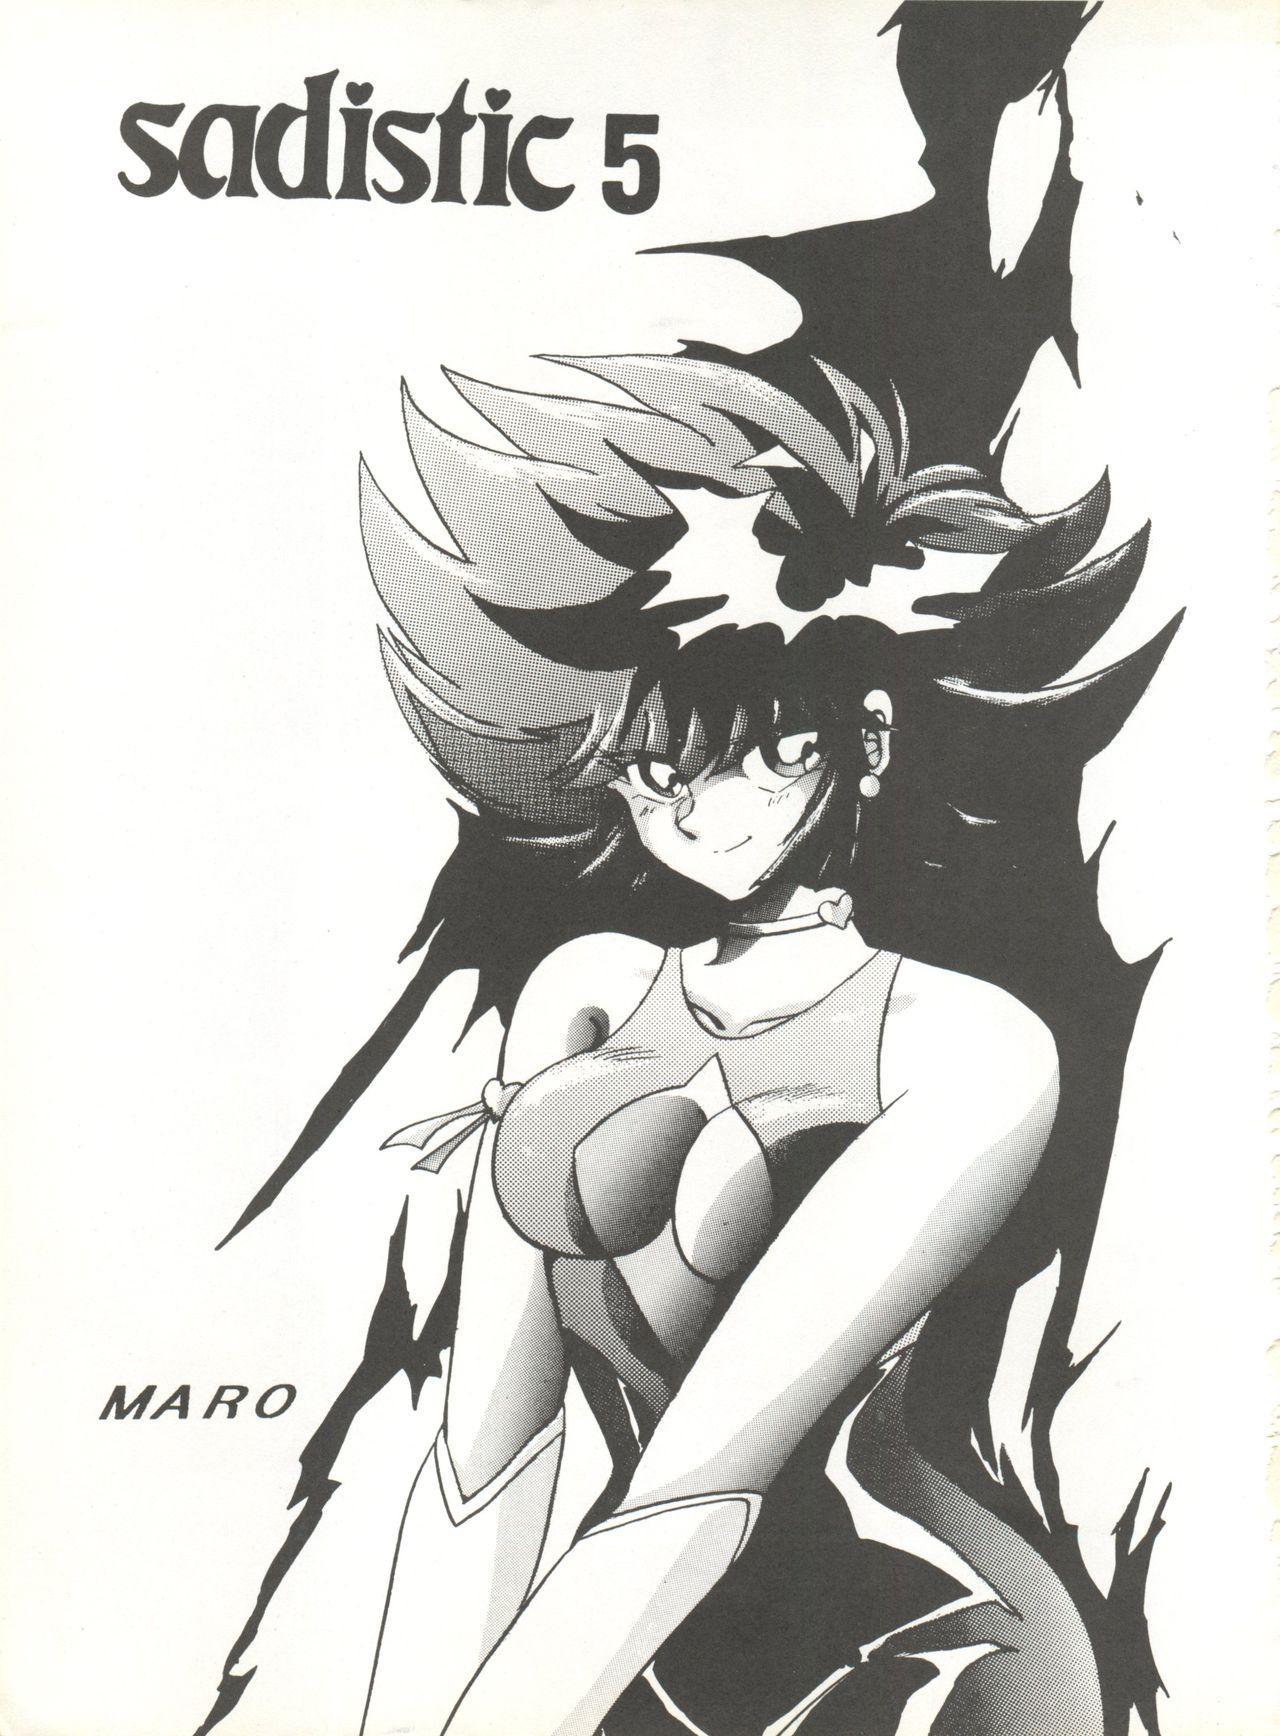 [Global One (MARO)] Sadistic 5 (Cutey Honey, Devilman, Sailor Moon), [Global One (MARO)] Sadistic (Dirty Pair, Fushigi no Umi no Nadia, Sailor Moon), [Studio Ikkatsumajin] .ribbon (Hime-chan's Ribbon) 2